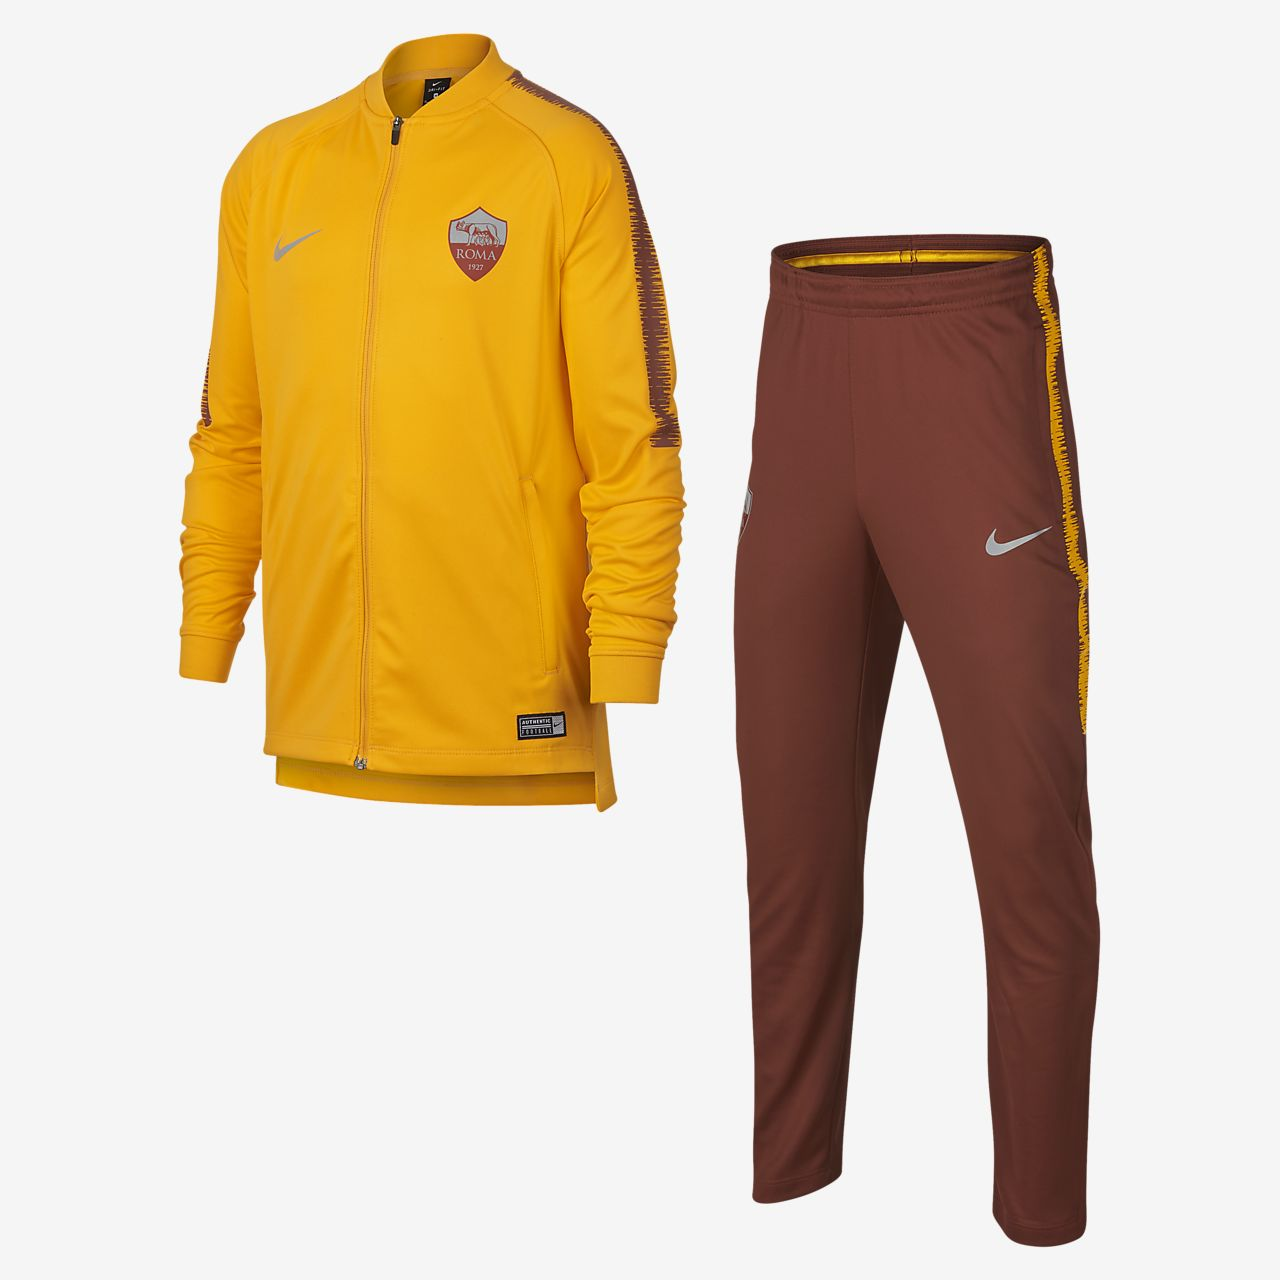 f7074c7dbb Dres piłkarski dla dużych dzieci A.S. Roma Dri-FIT Squad. Nike.com PL